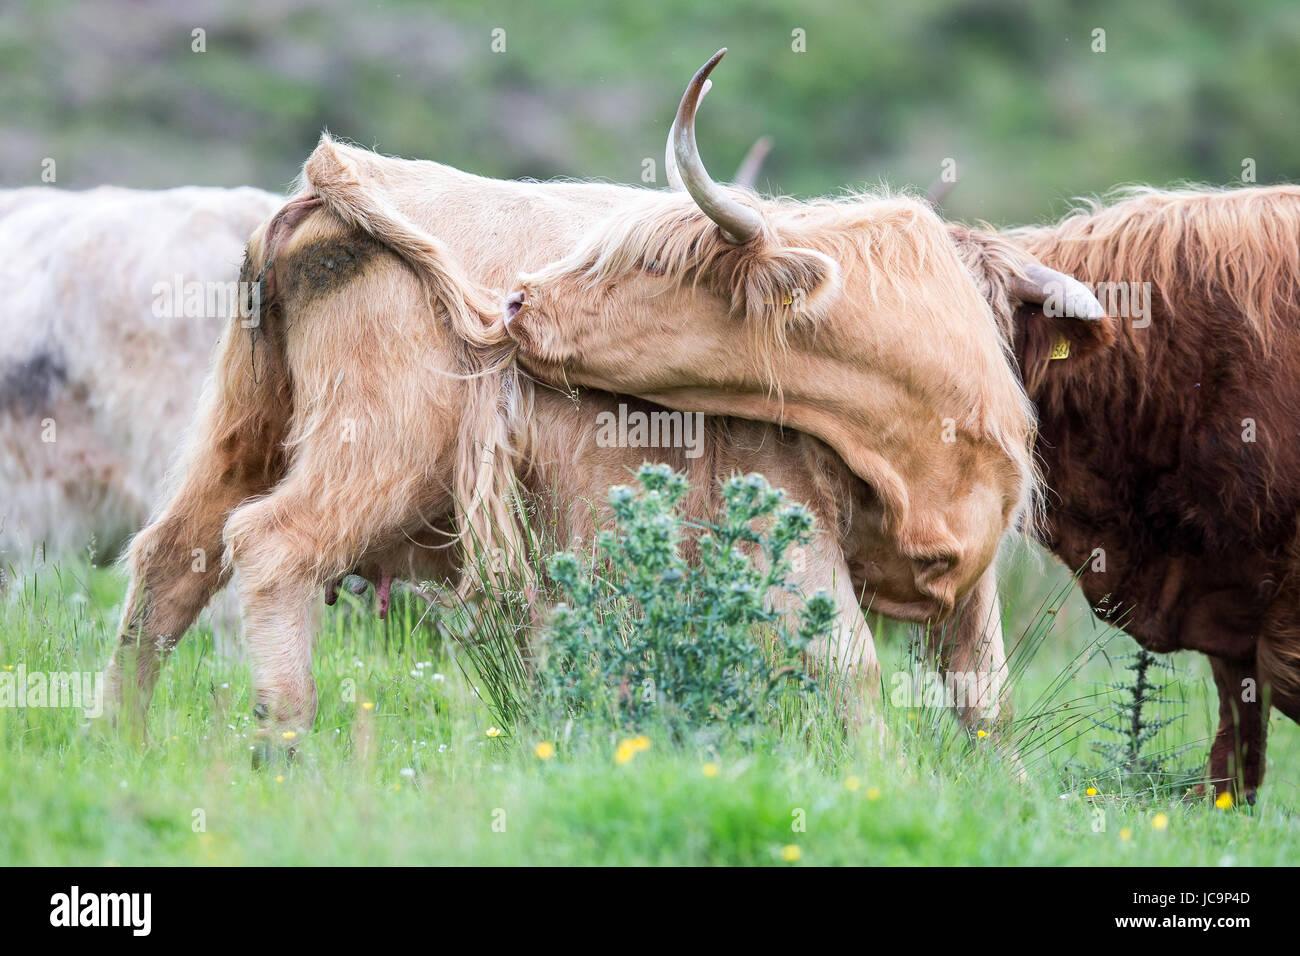 Highland Cattle Immagini Stock